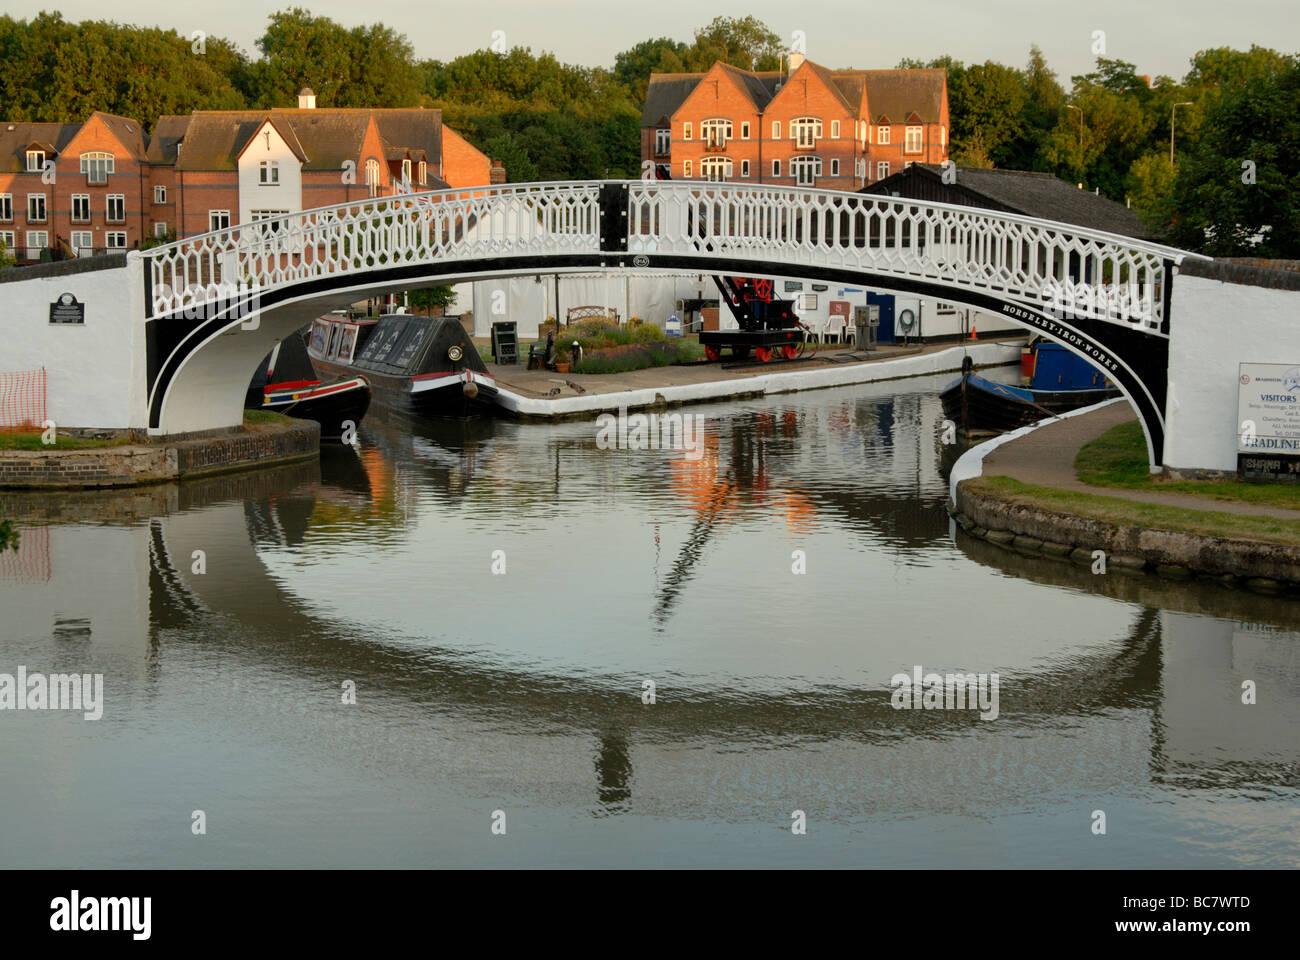 Black and White Victorian ironwork bridge over canal at entrance to Braunston Marina at dusk, Braunston, Northamptonshire - Stock Image